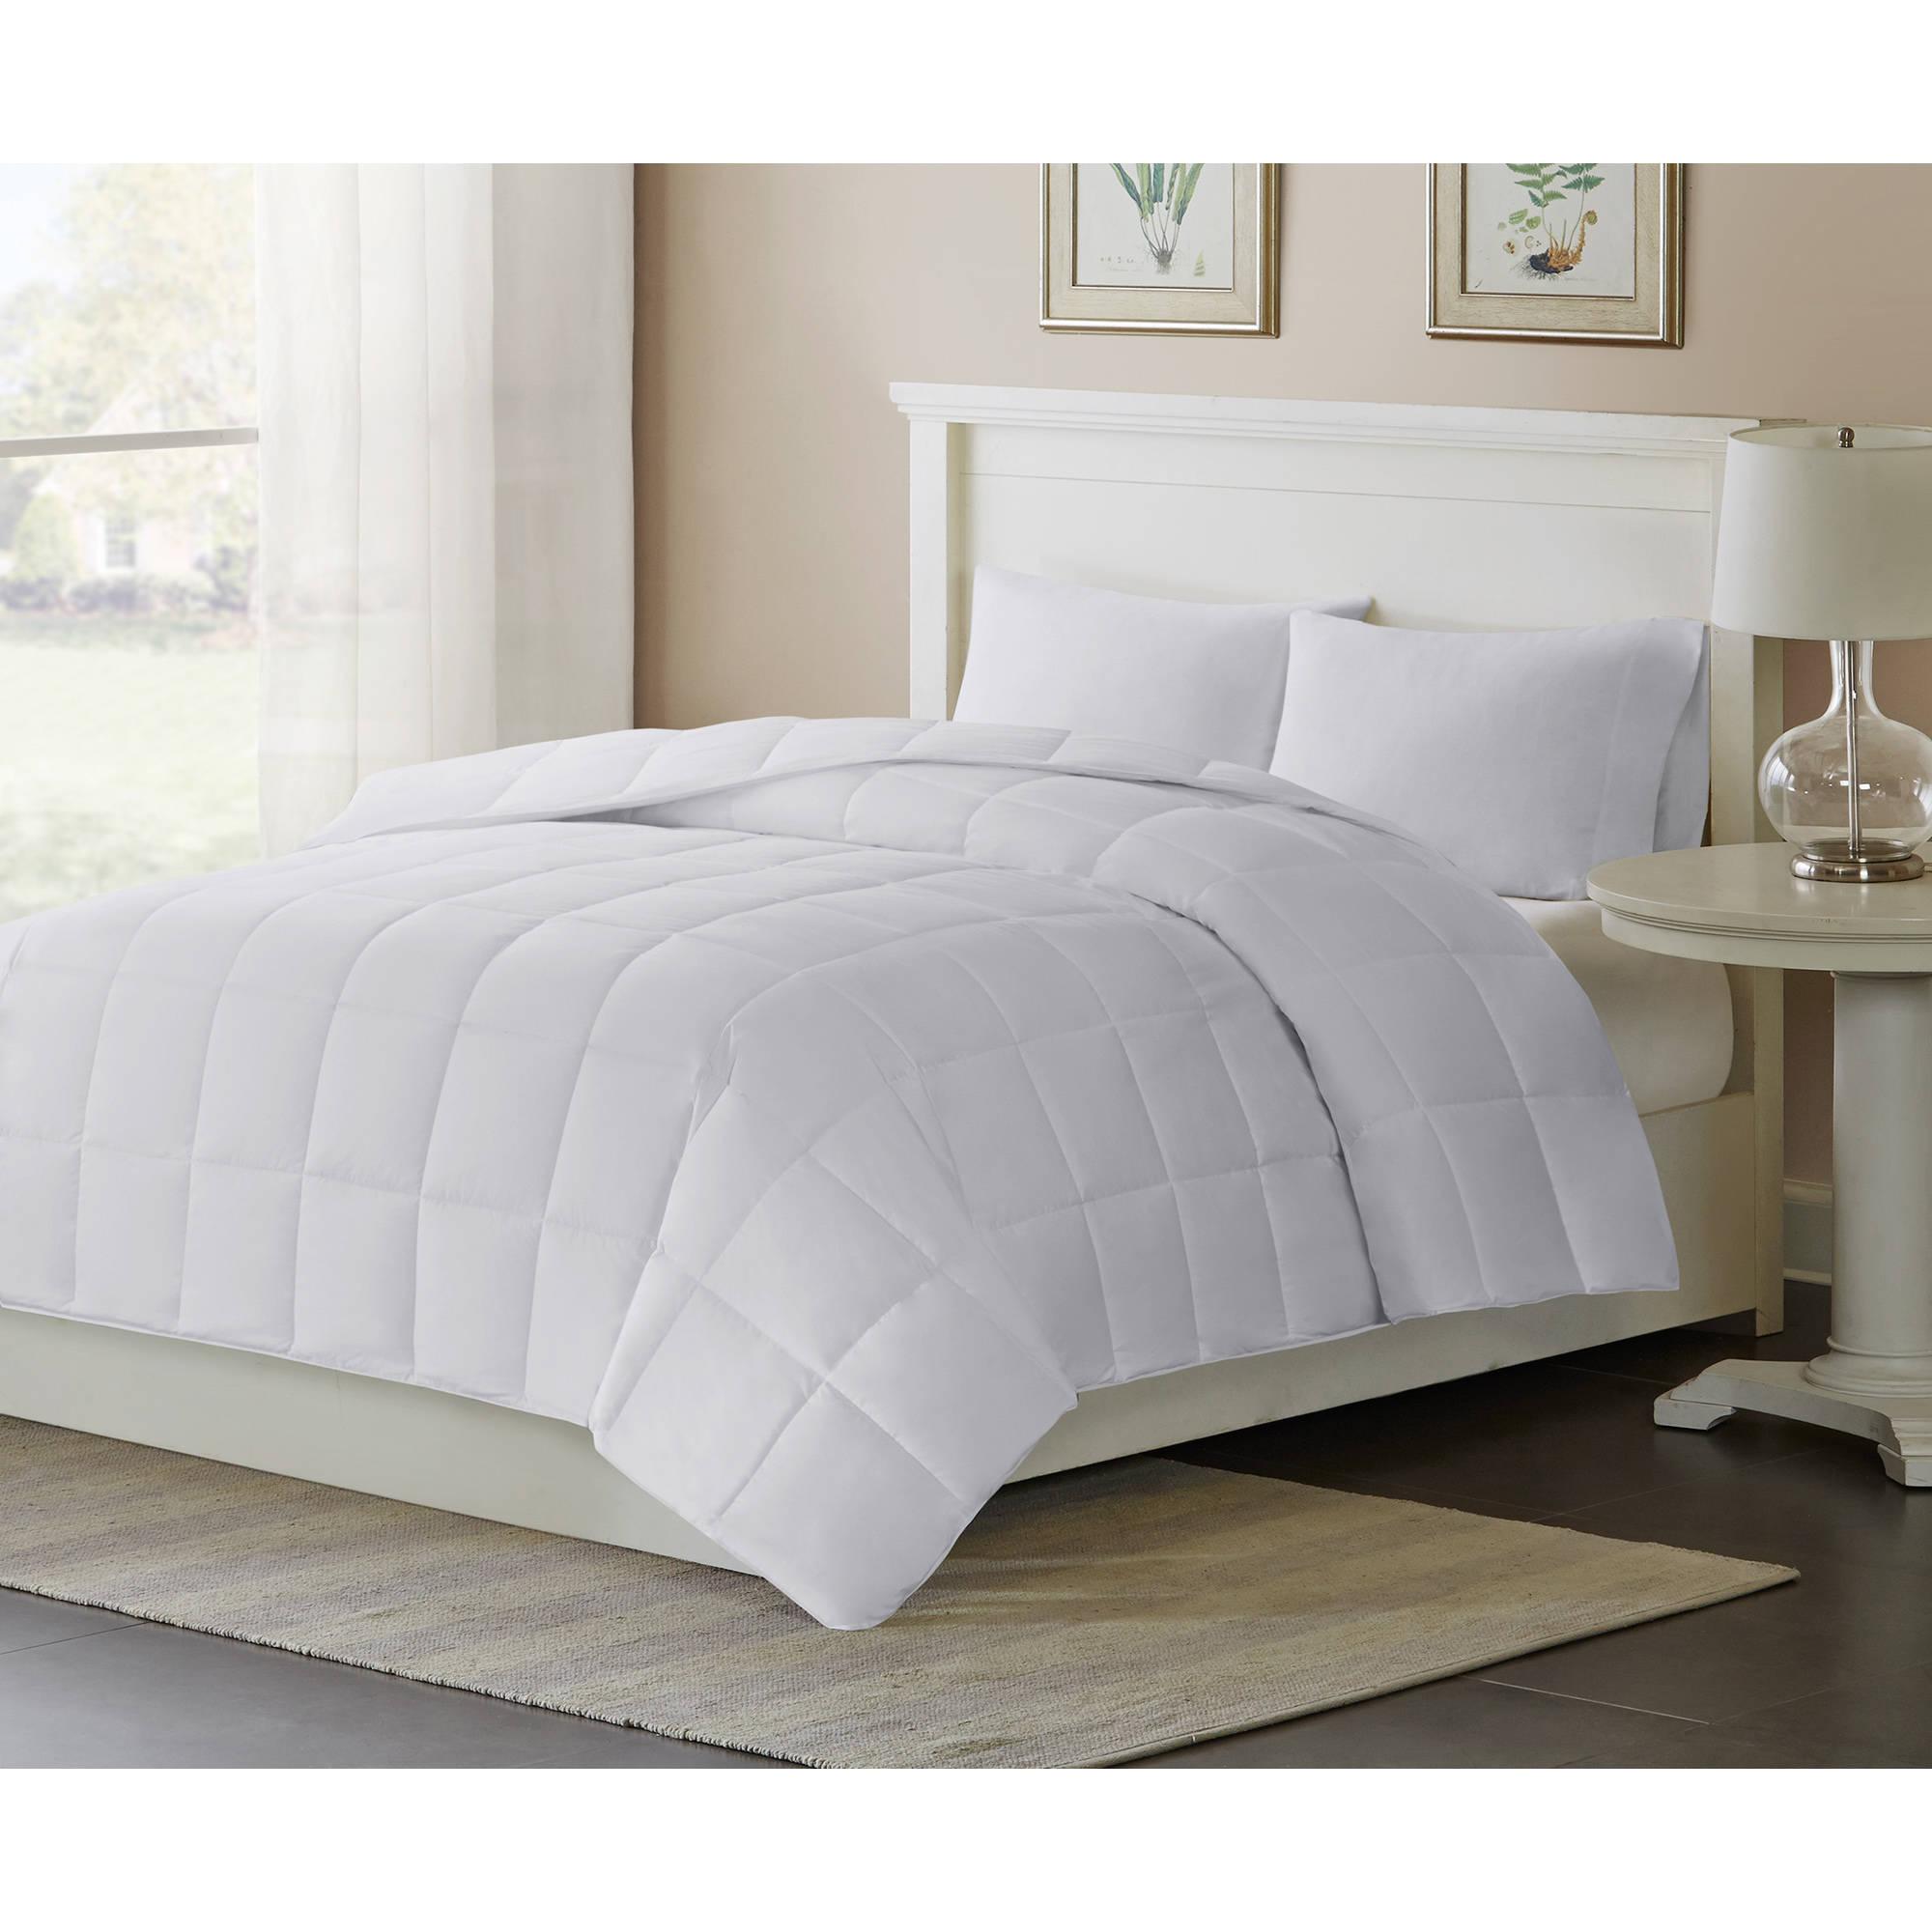 Comfort Classics 3M Thinsulate Down Alternative Comforter, Level 2